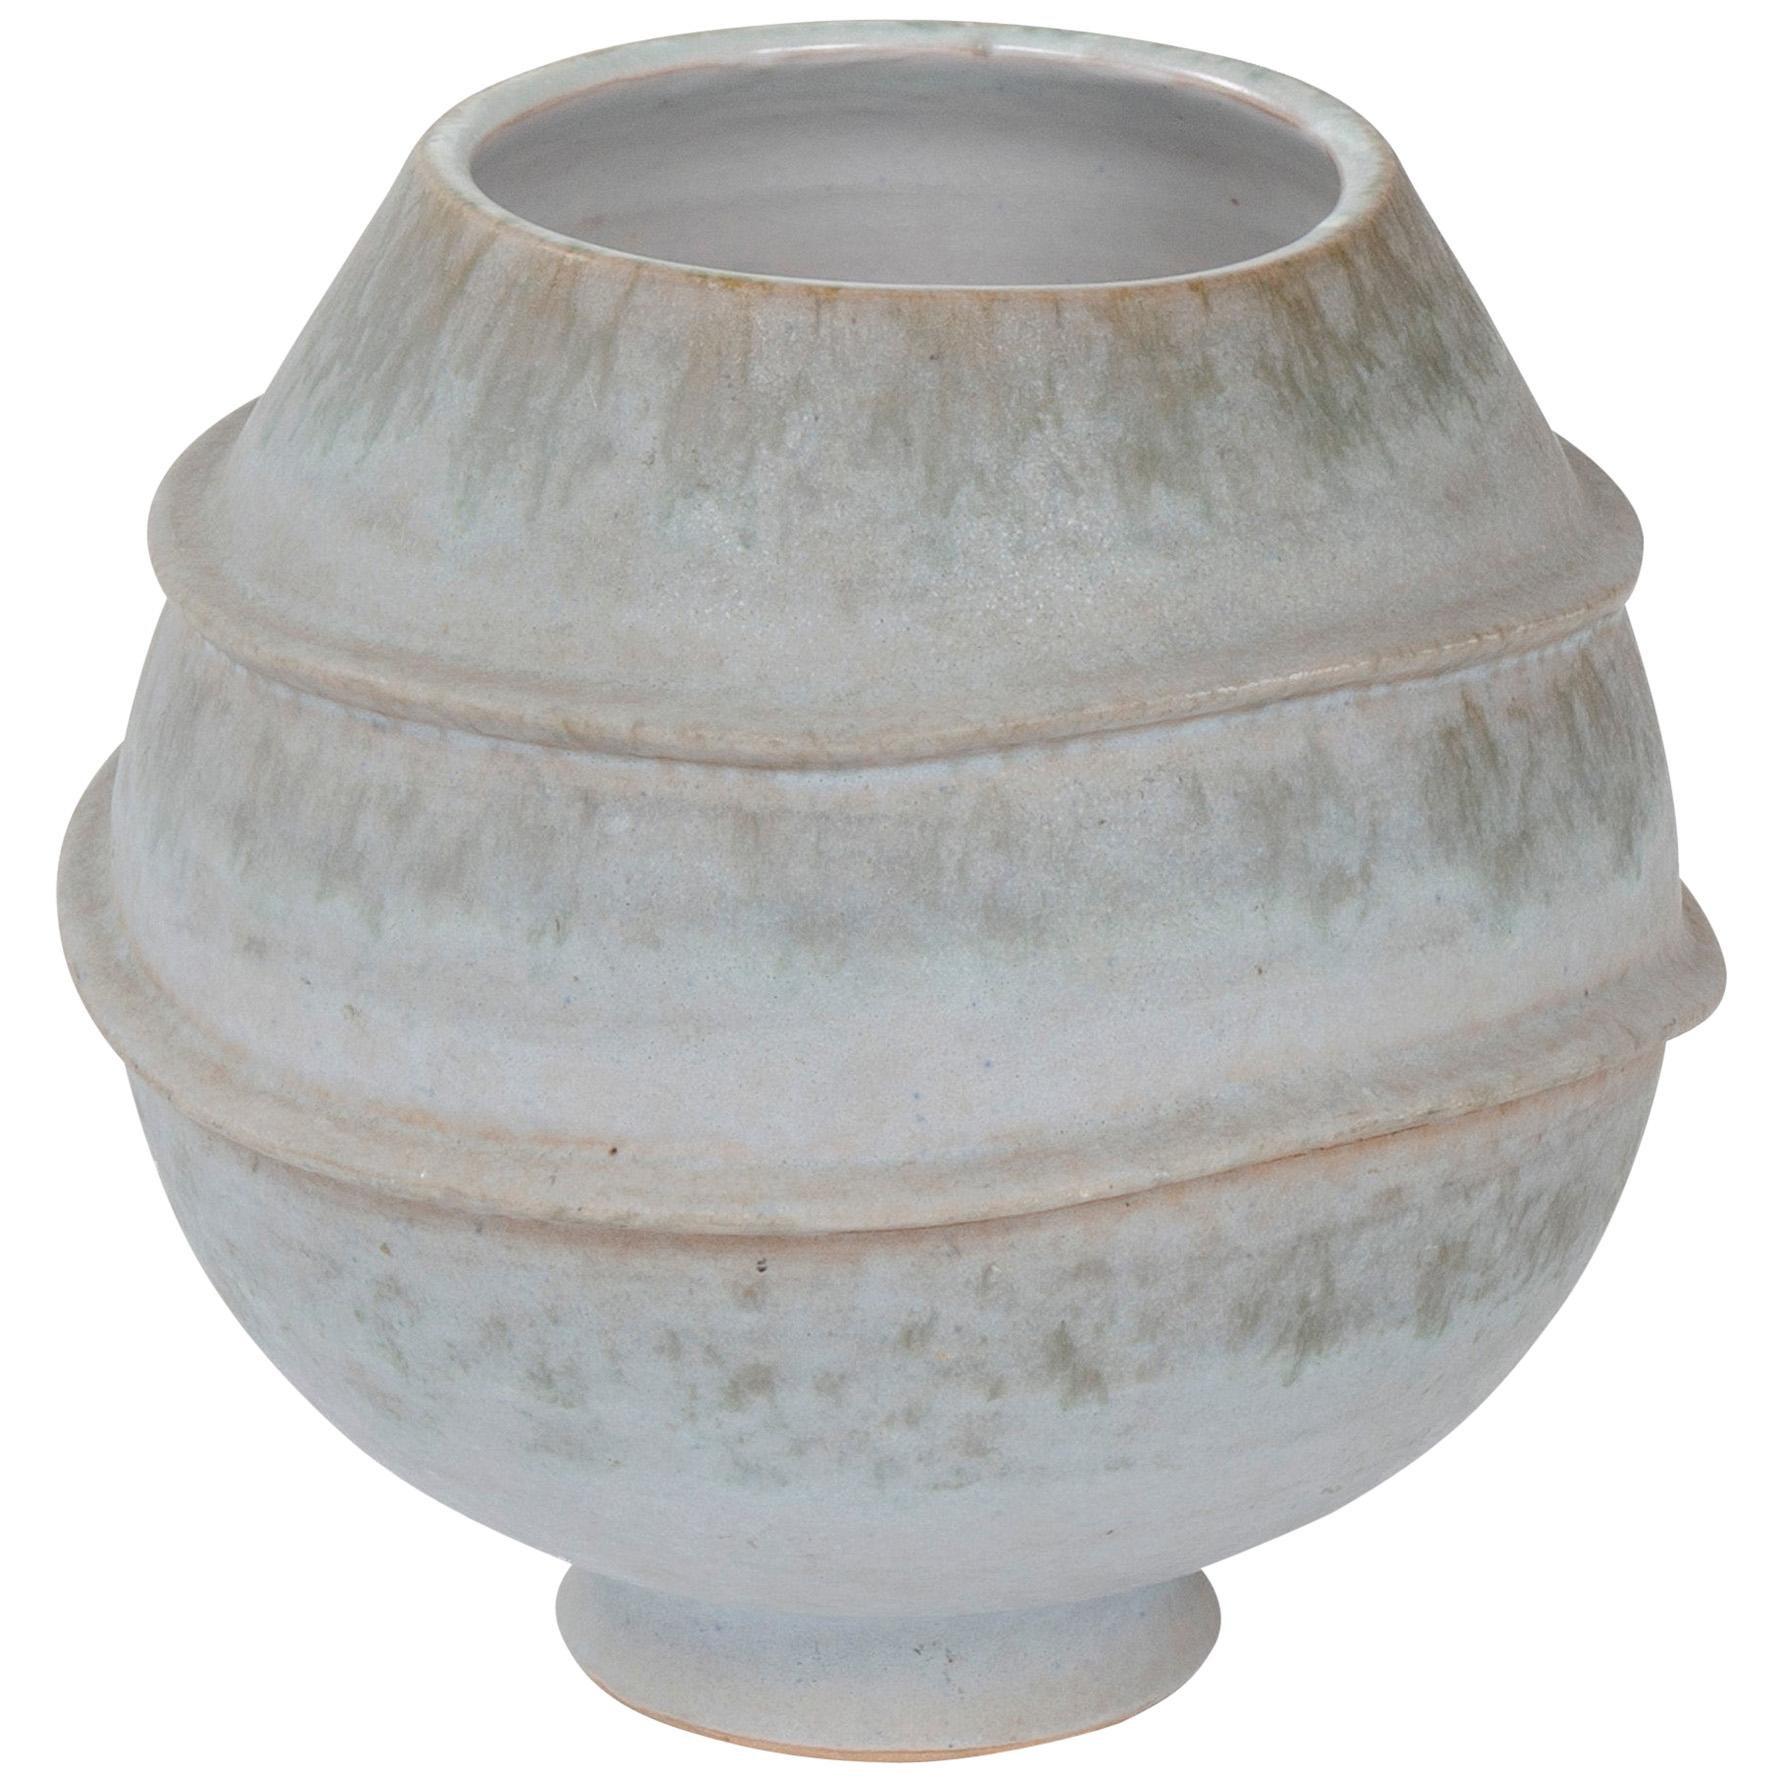 1960s Italian Ceramic Footed Vase by Raymor